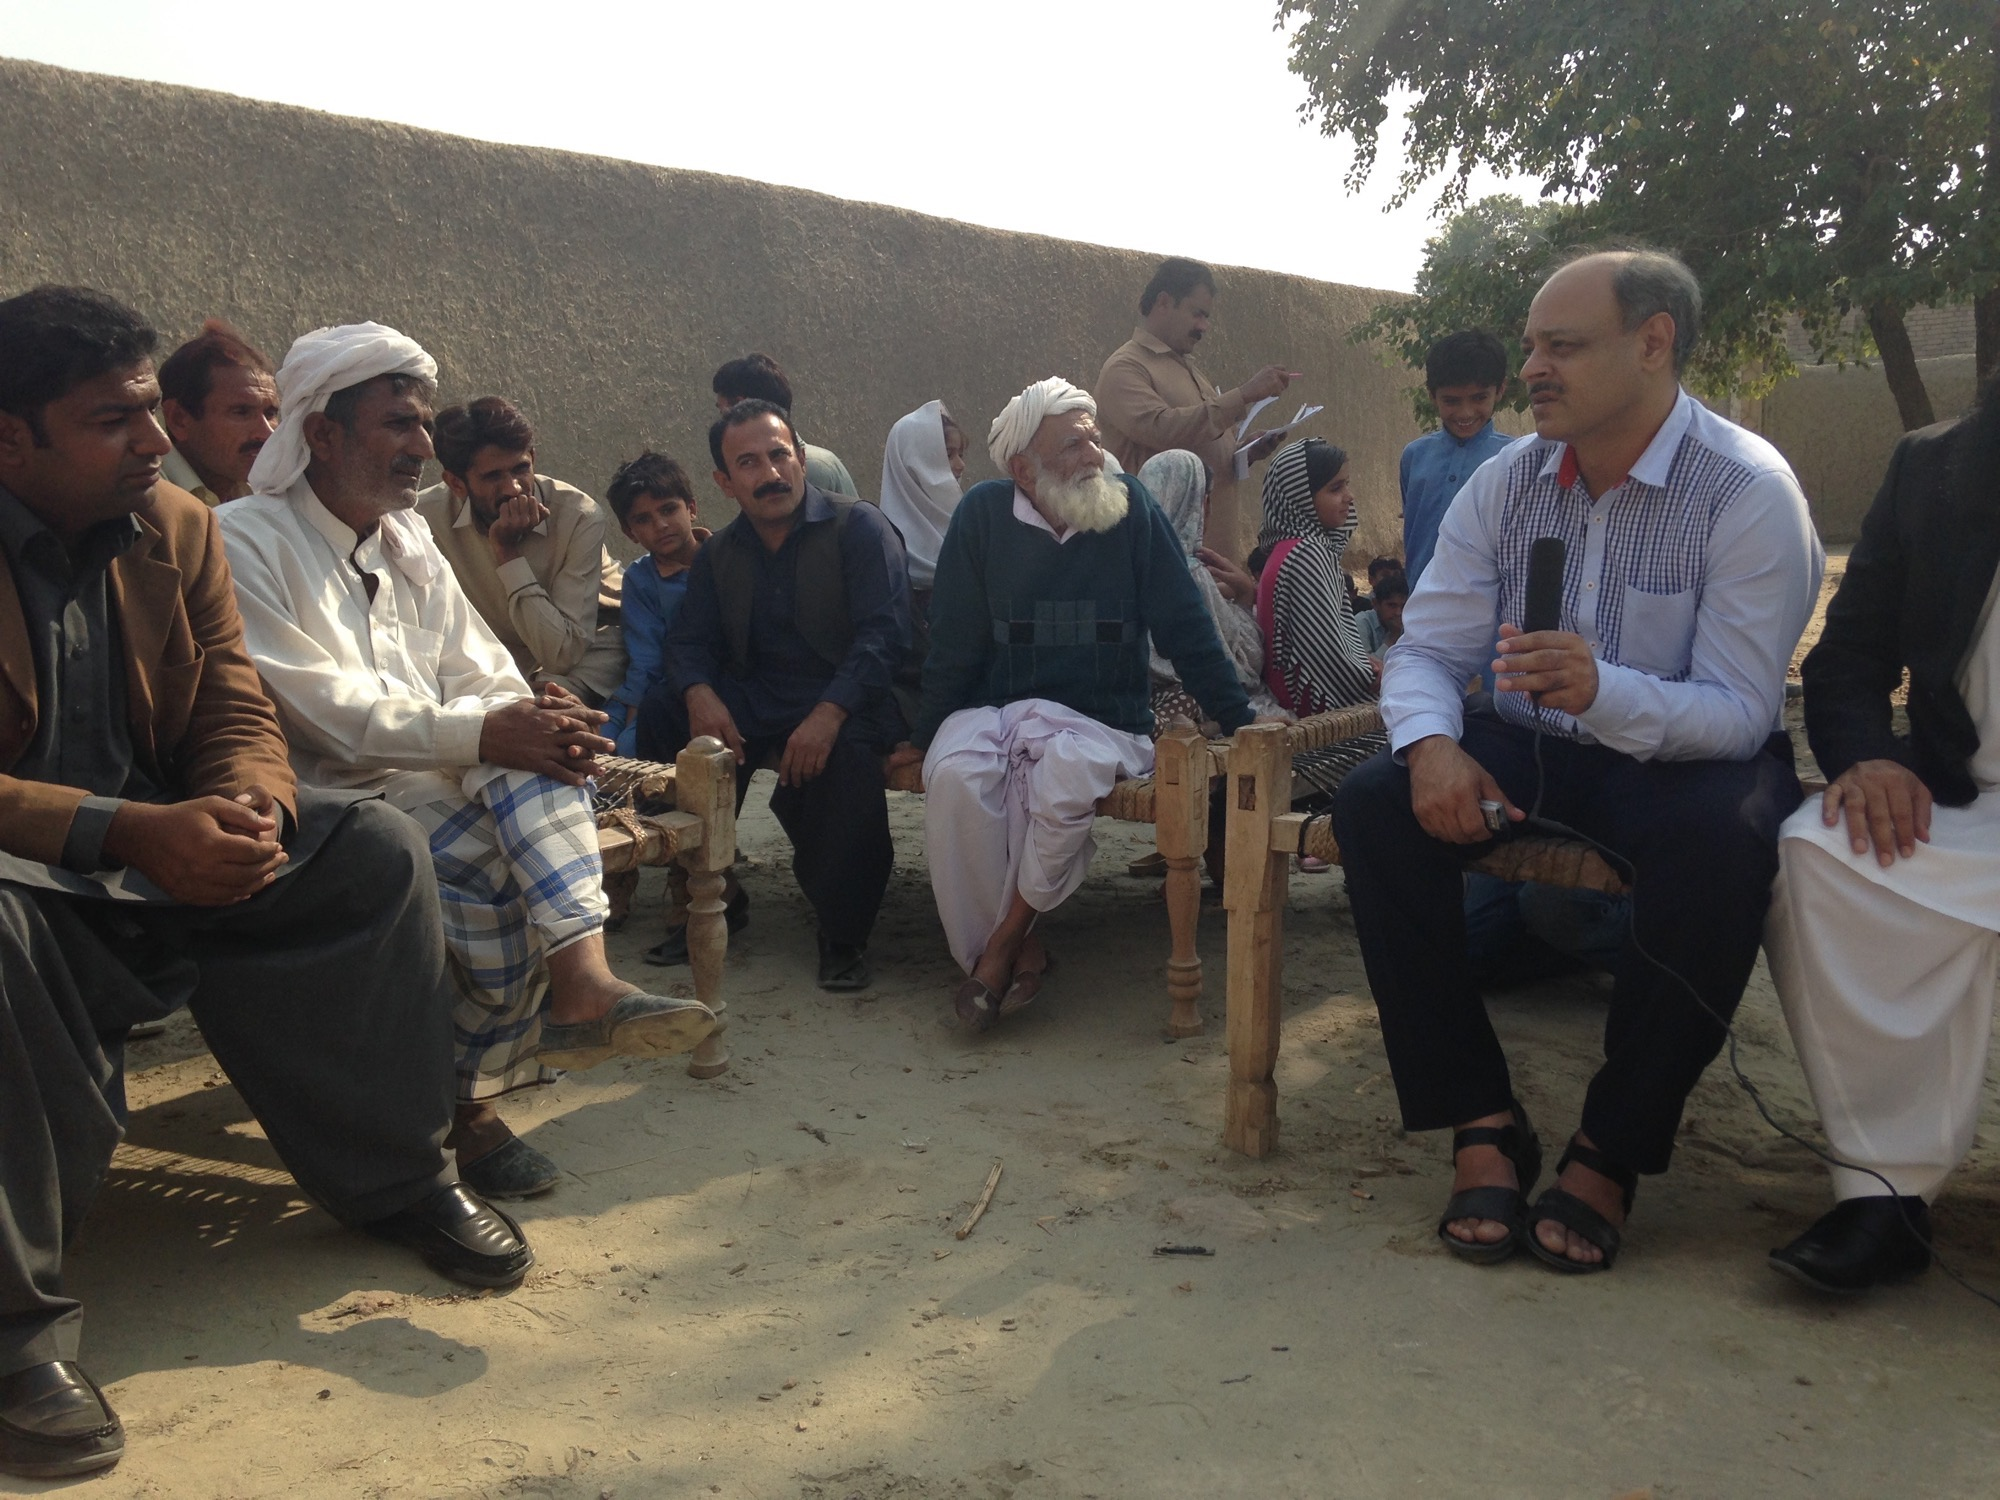 Mittendrin: Assad bei den Dorfältesten der Baumwoll-Kooperative.